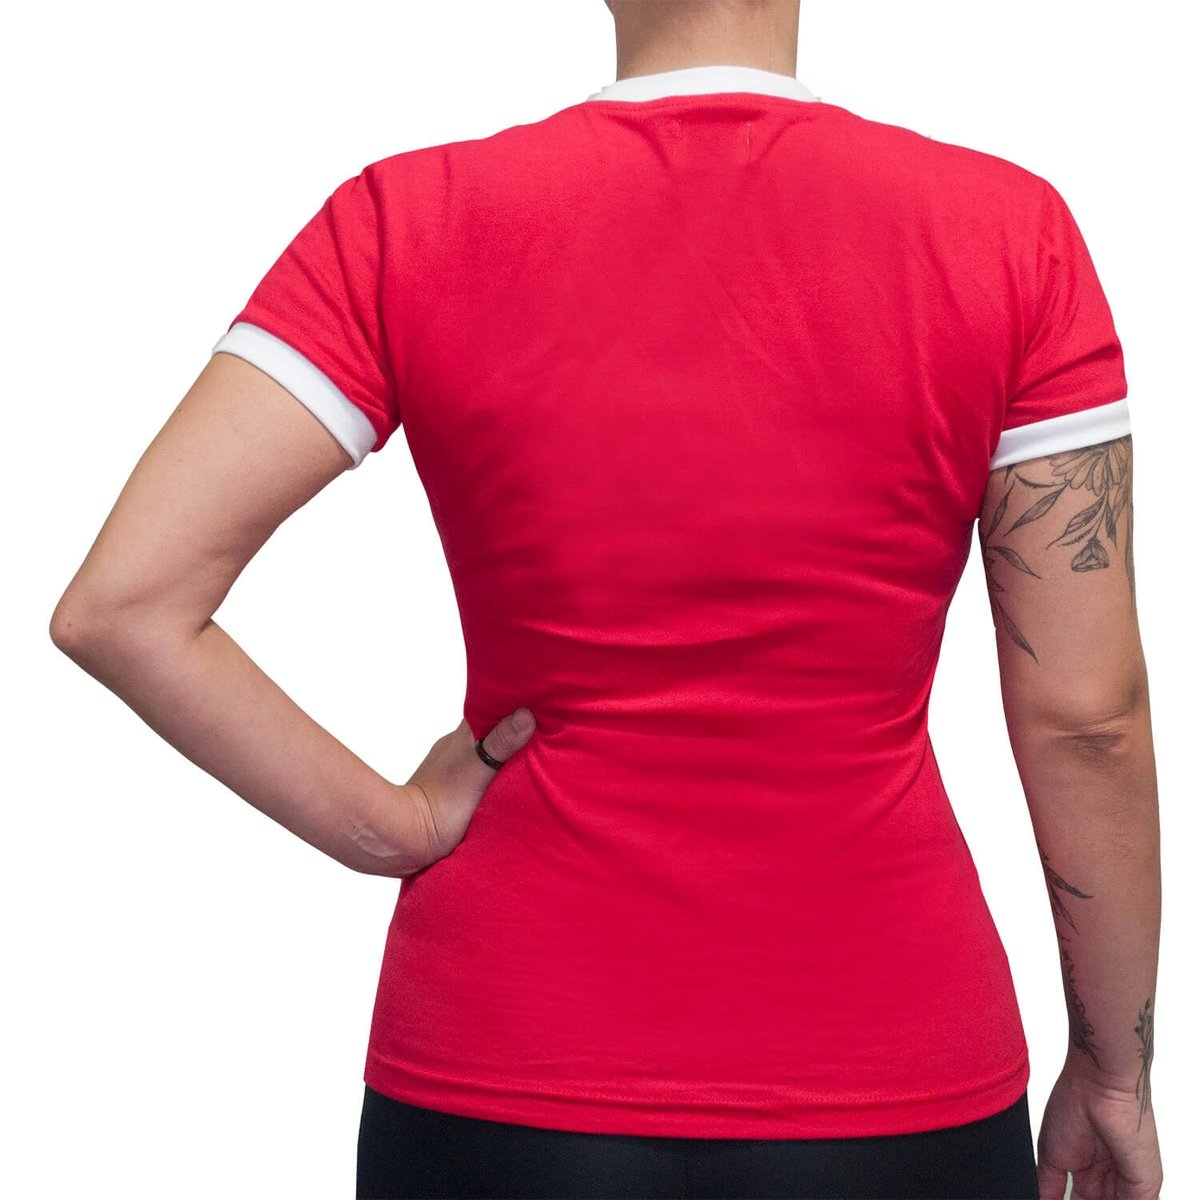 ... Vermelho Retrô Camisa Retrô Camisa Internacional 1975 Mania Feminina  g00qEwZ6a ... f865d3d6f0936